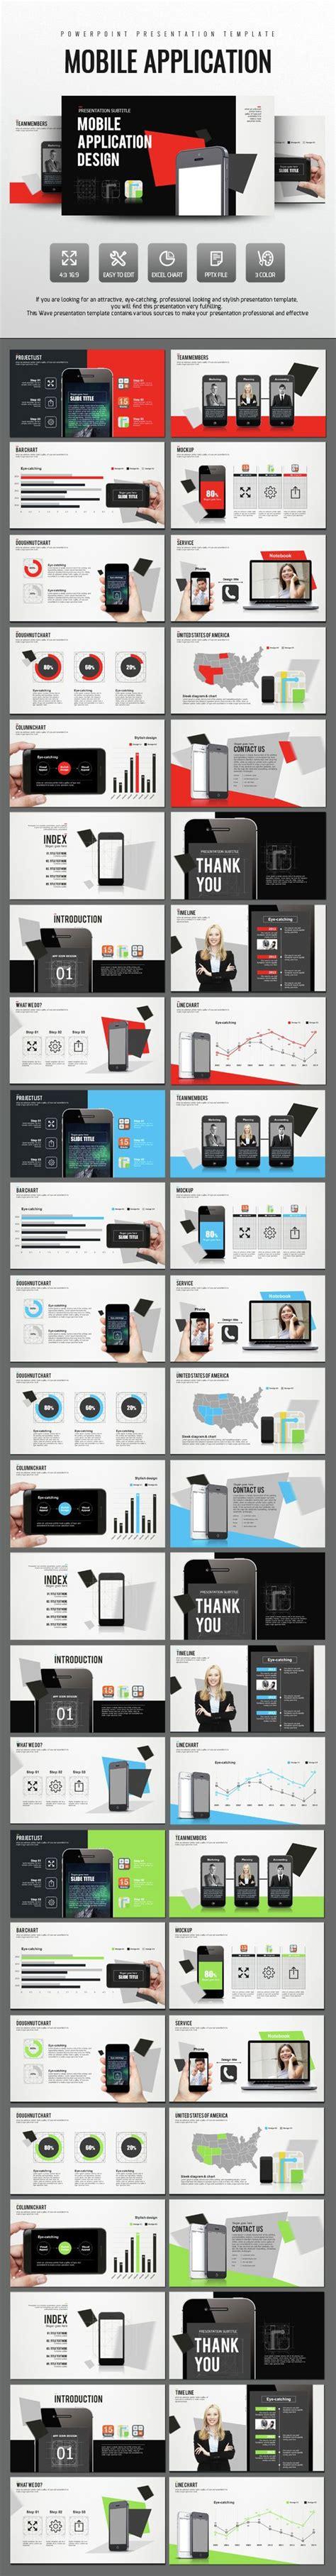 design board application best 25 application design ideas on pinterest app